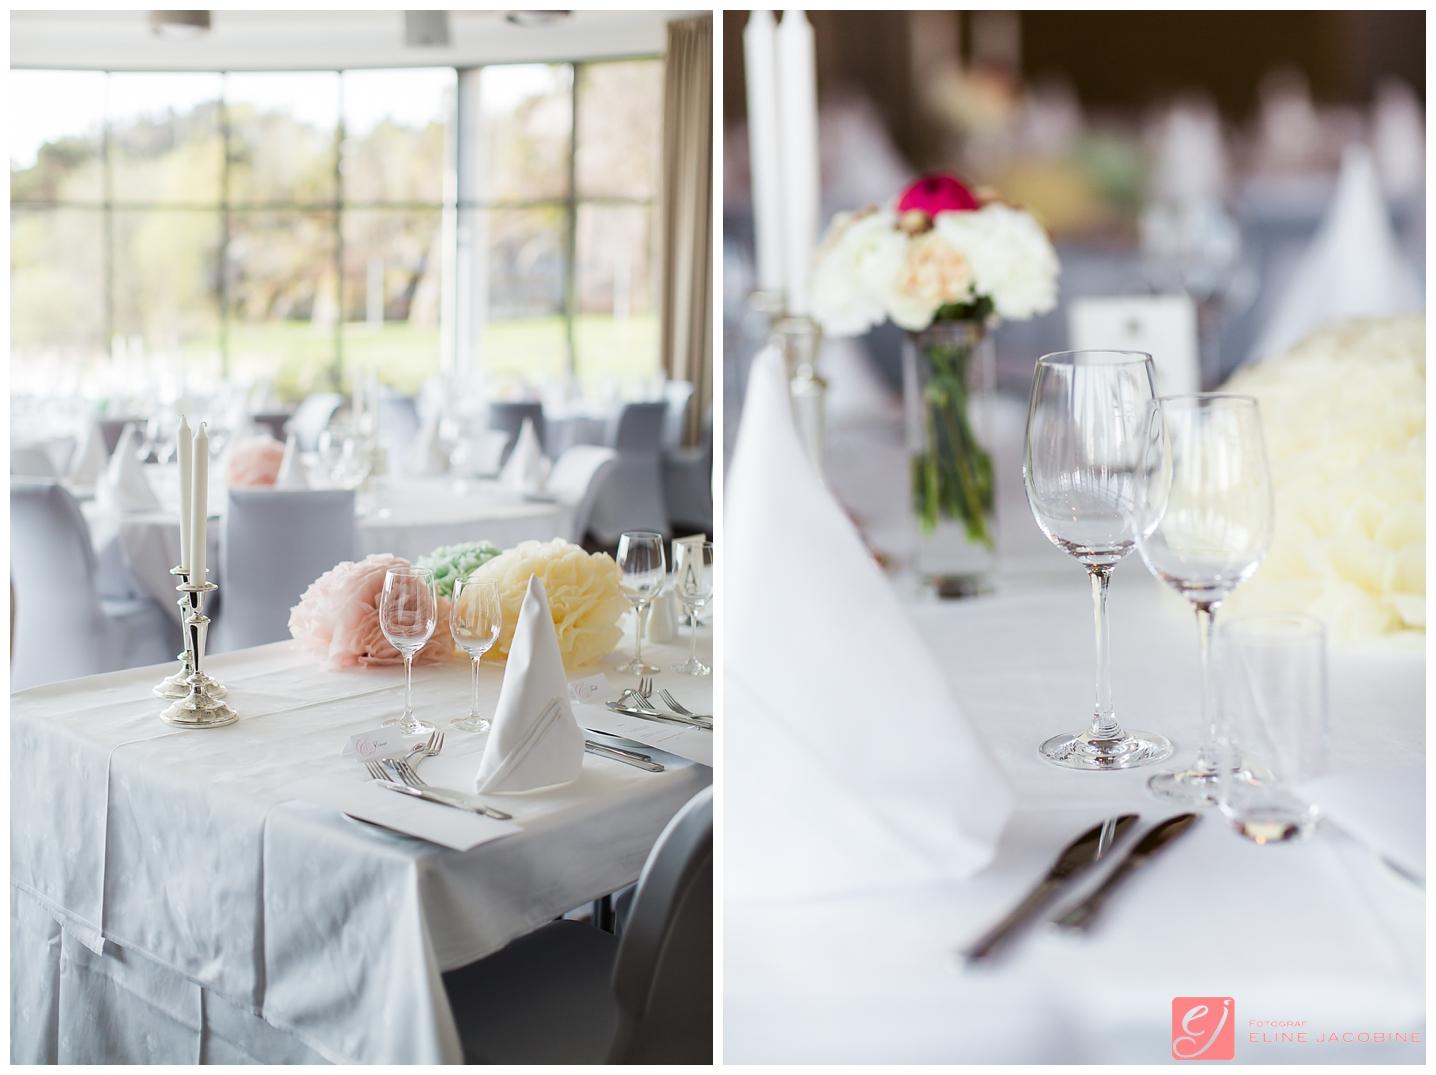 Bord Strand Hotell bryllup